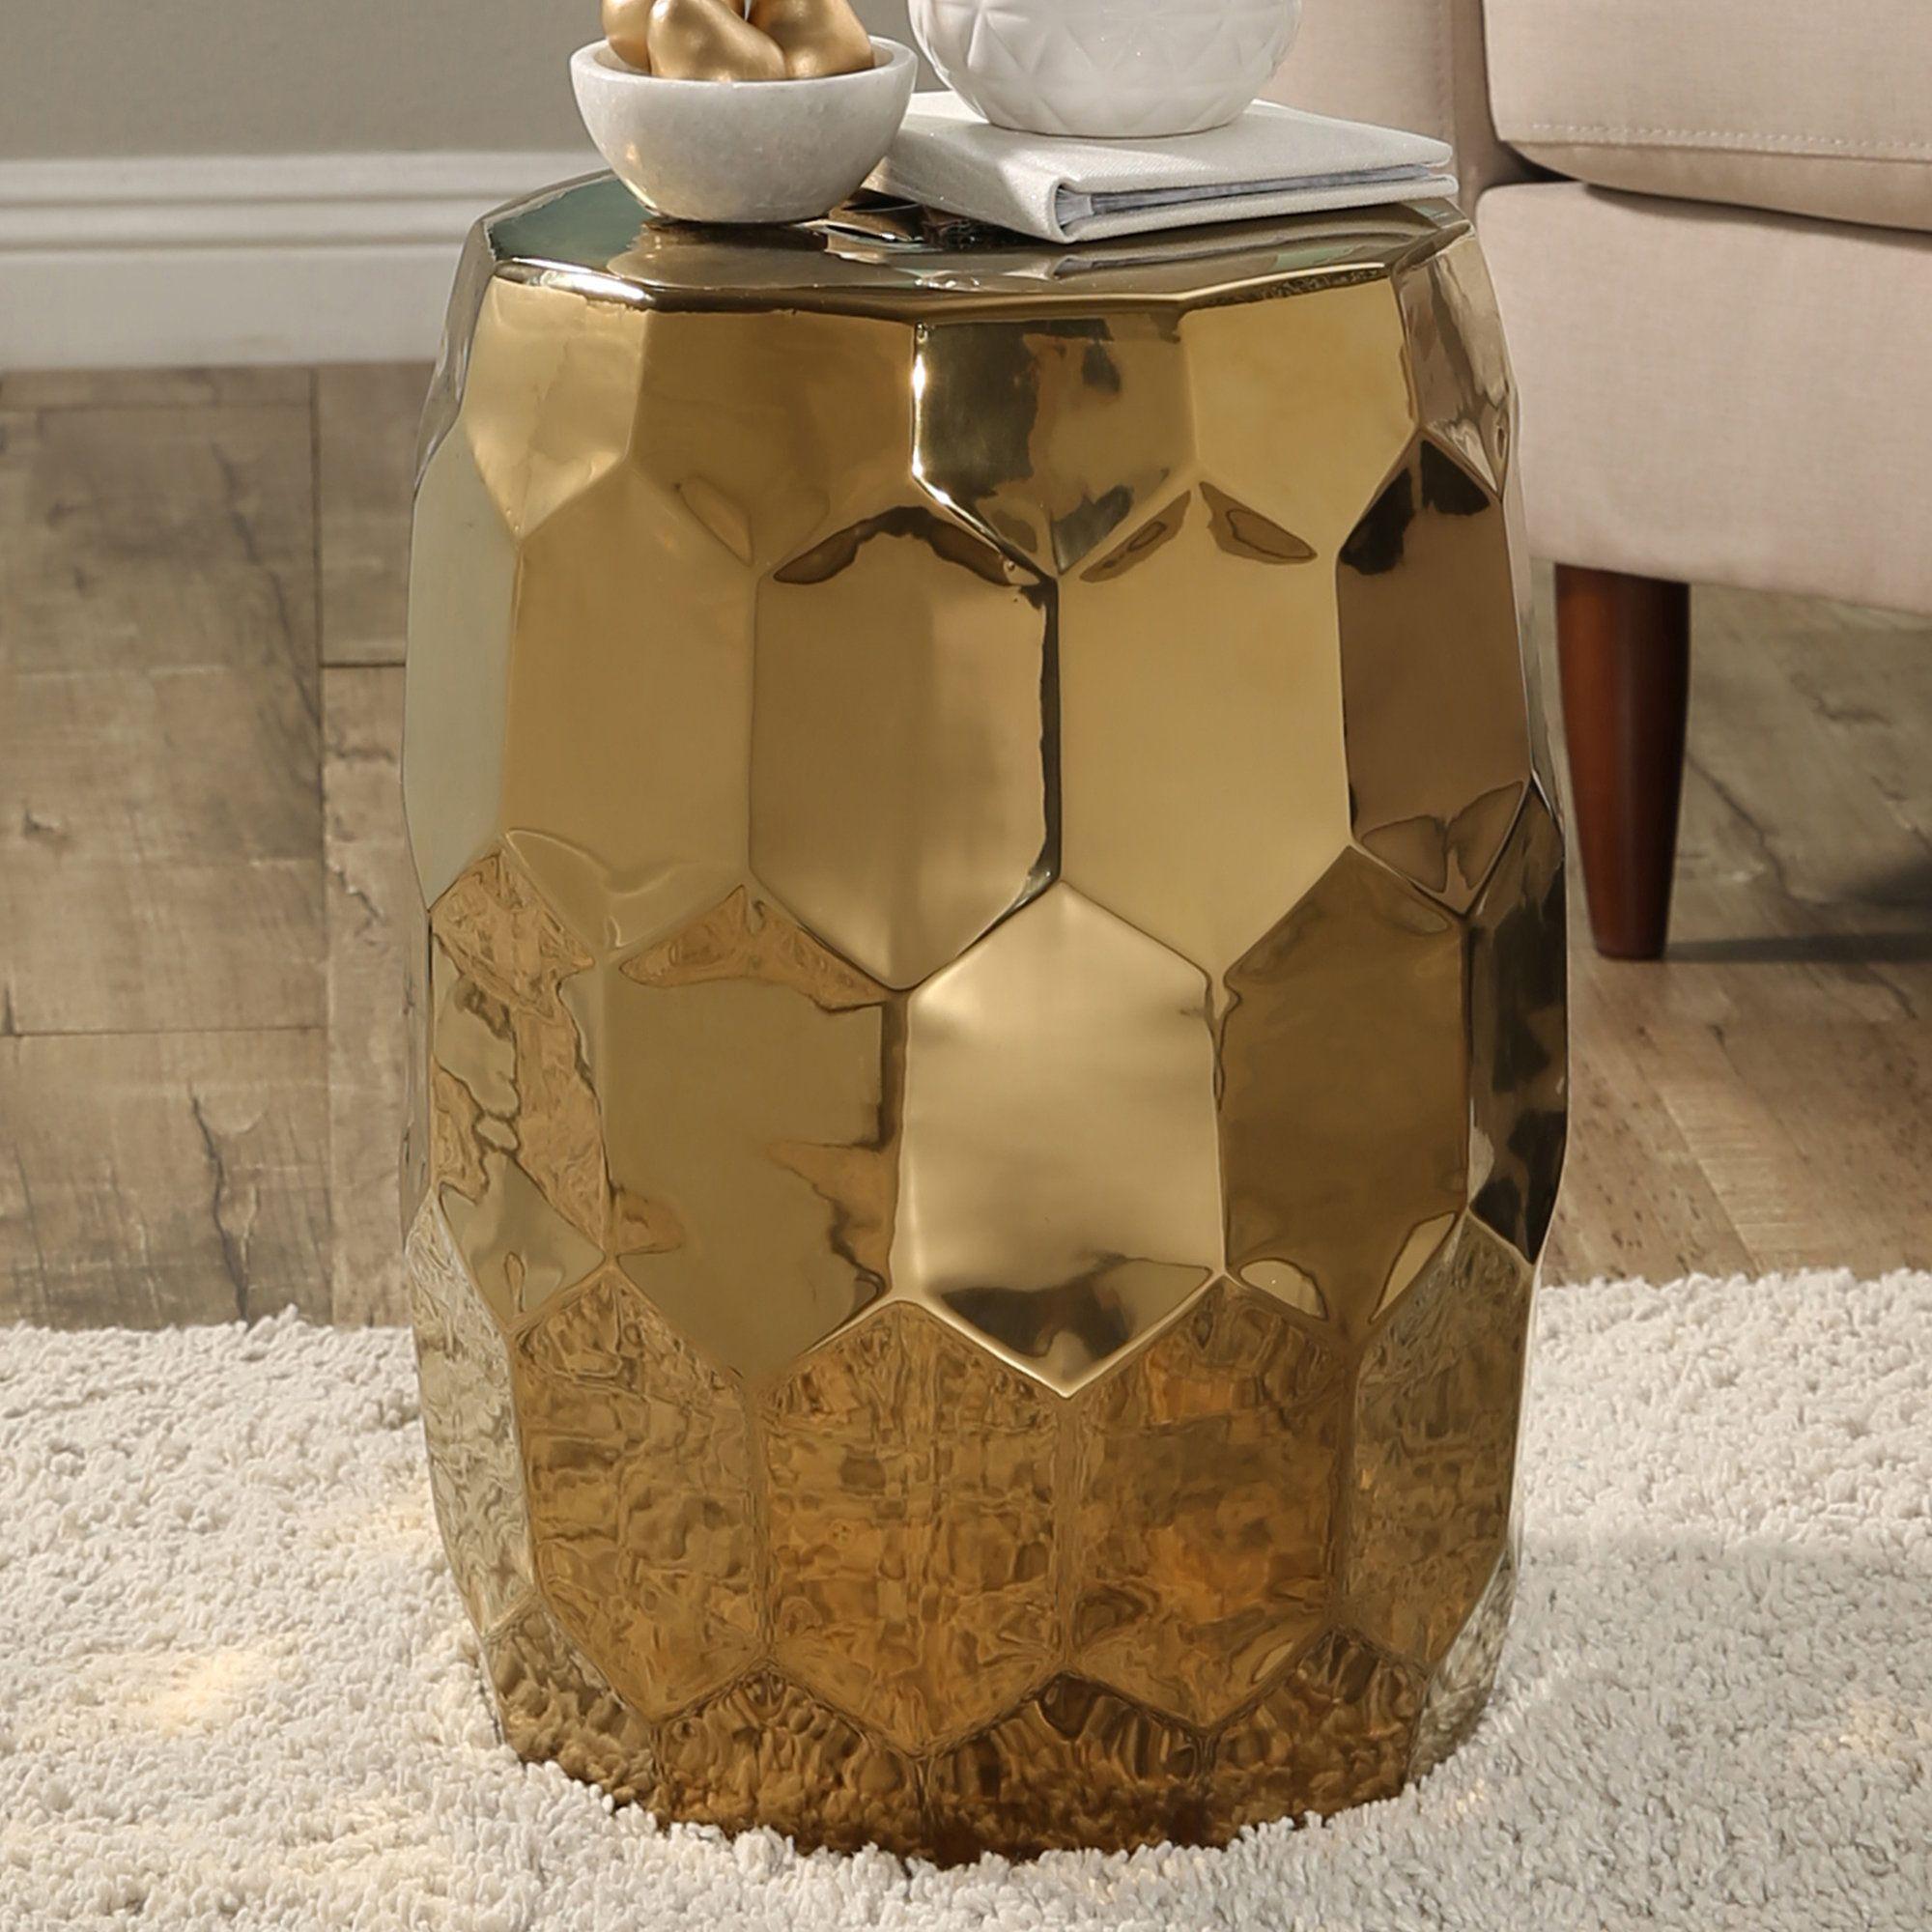 Sousa Ceramic Garden Stool | Products | Pinterest | Ceramic garden ...